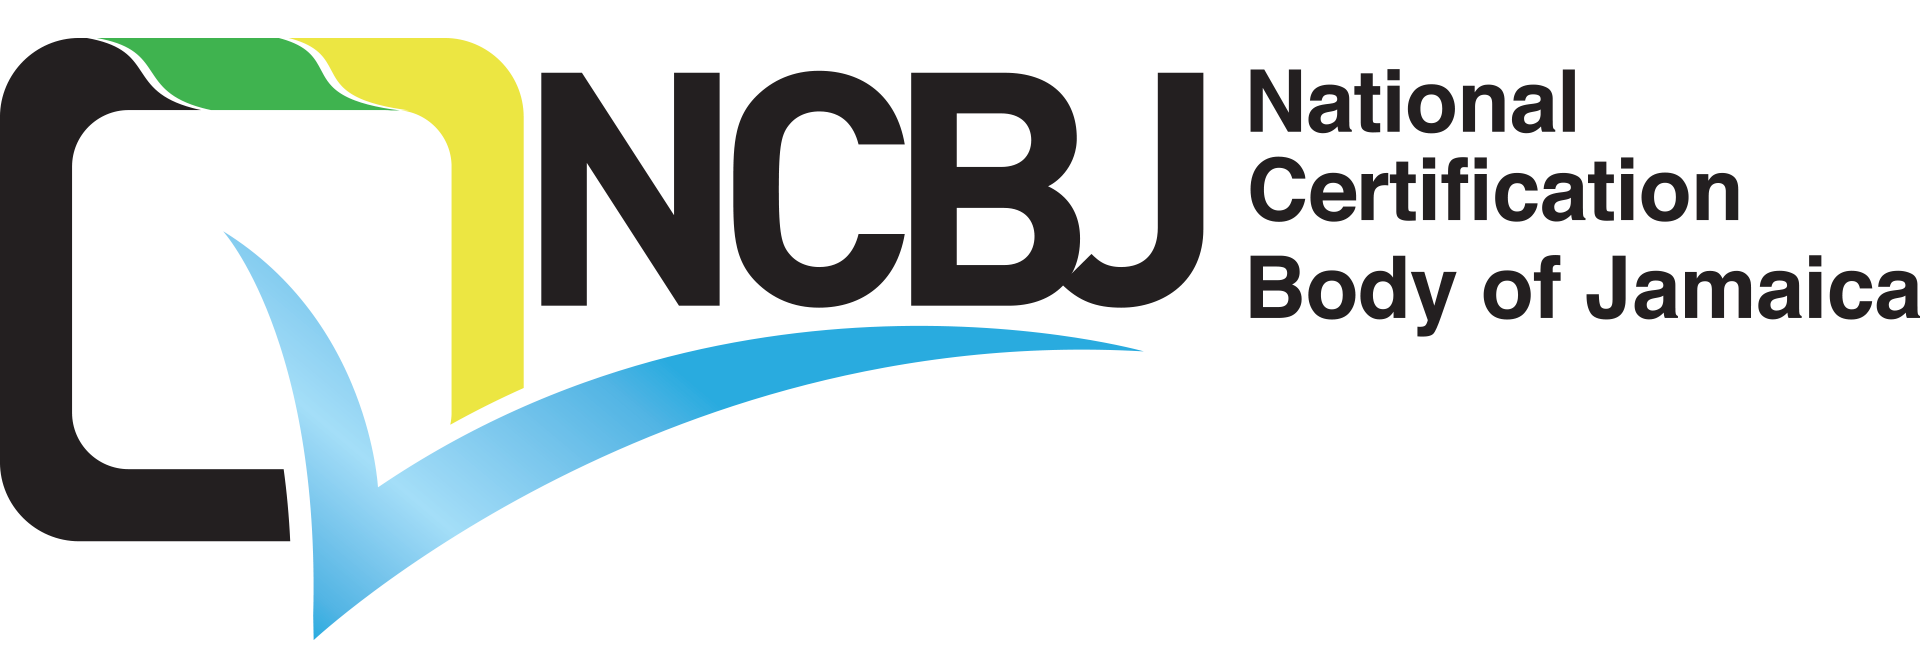 Ncbj National Certification Body Of Jamaica